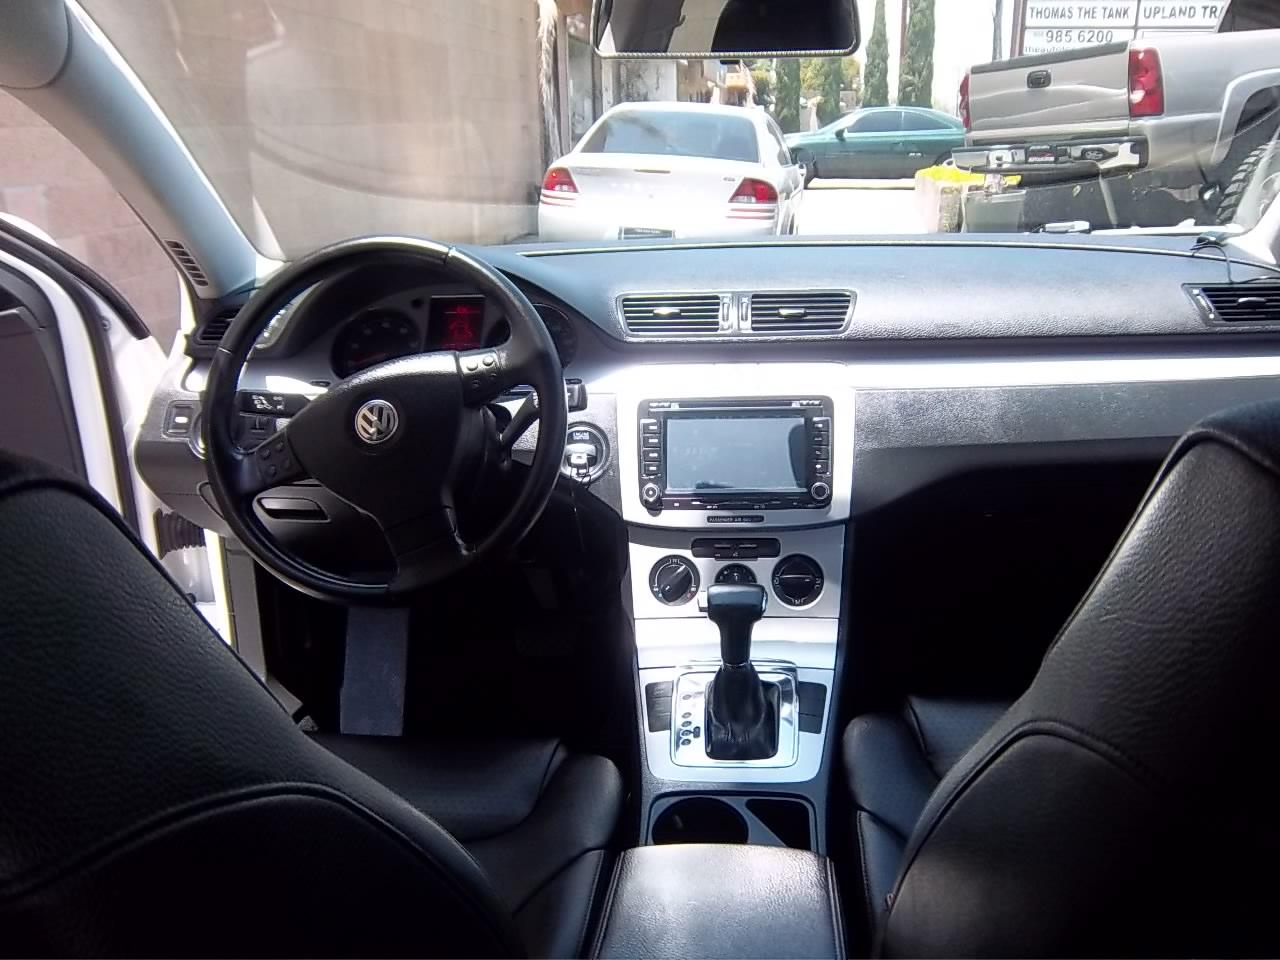 2008 Volkswagen Passat Interior Pictures Cargurus